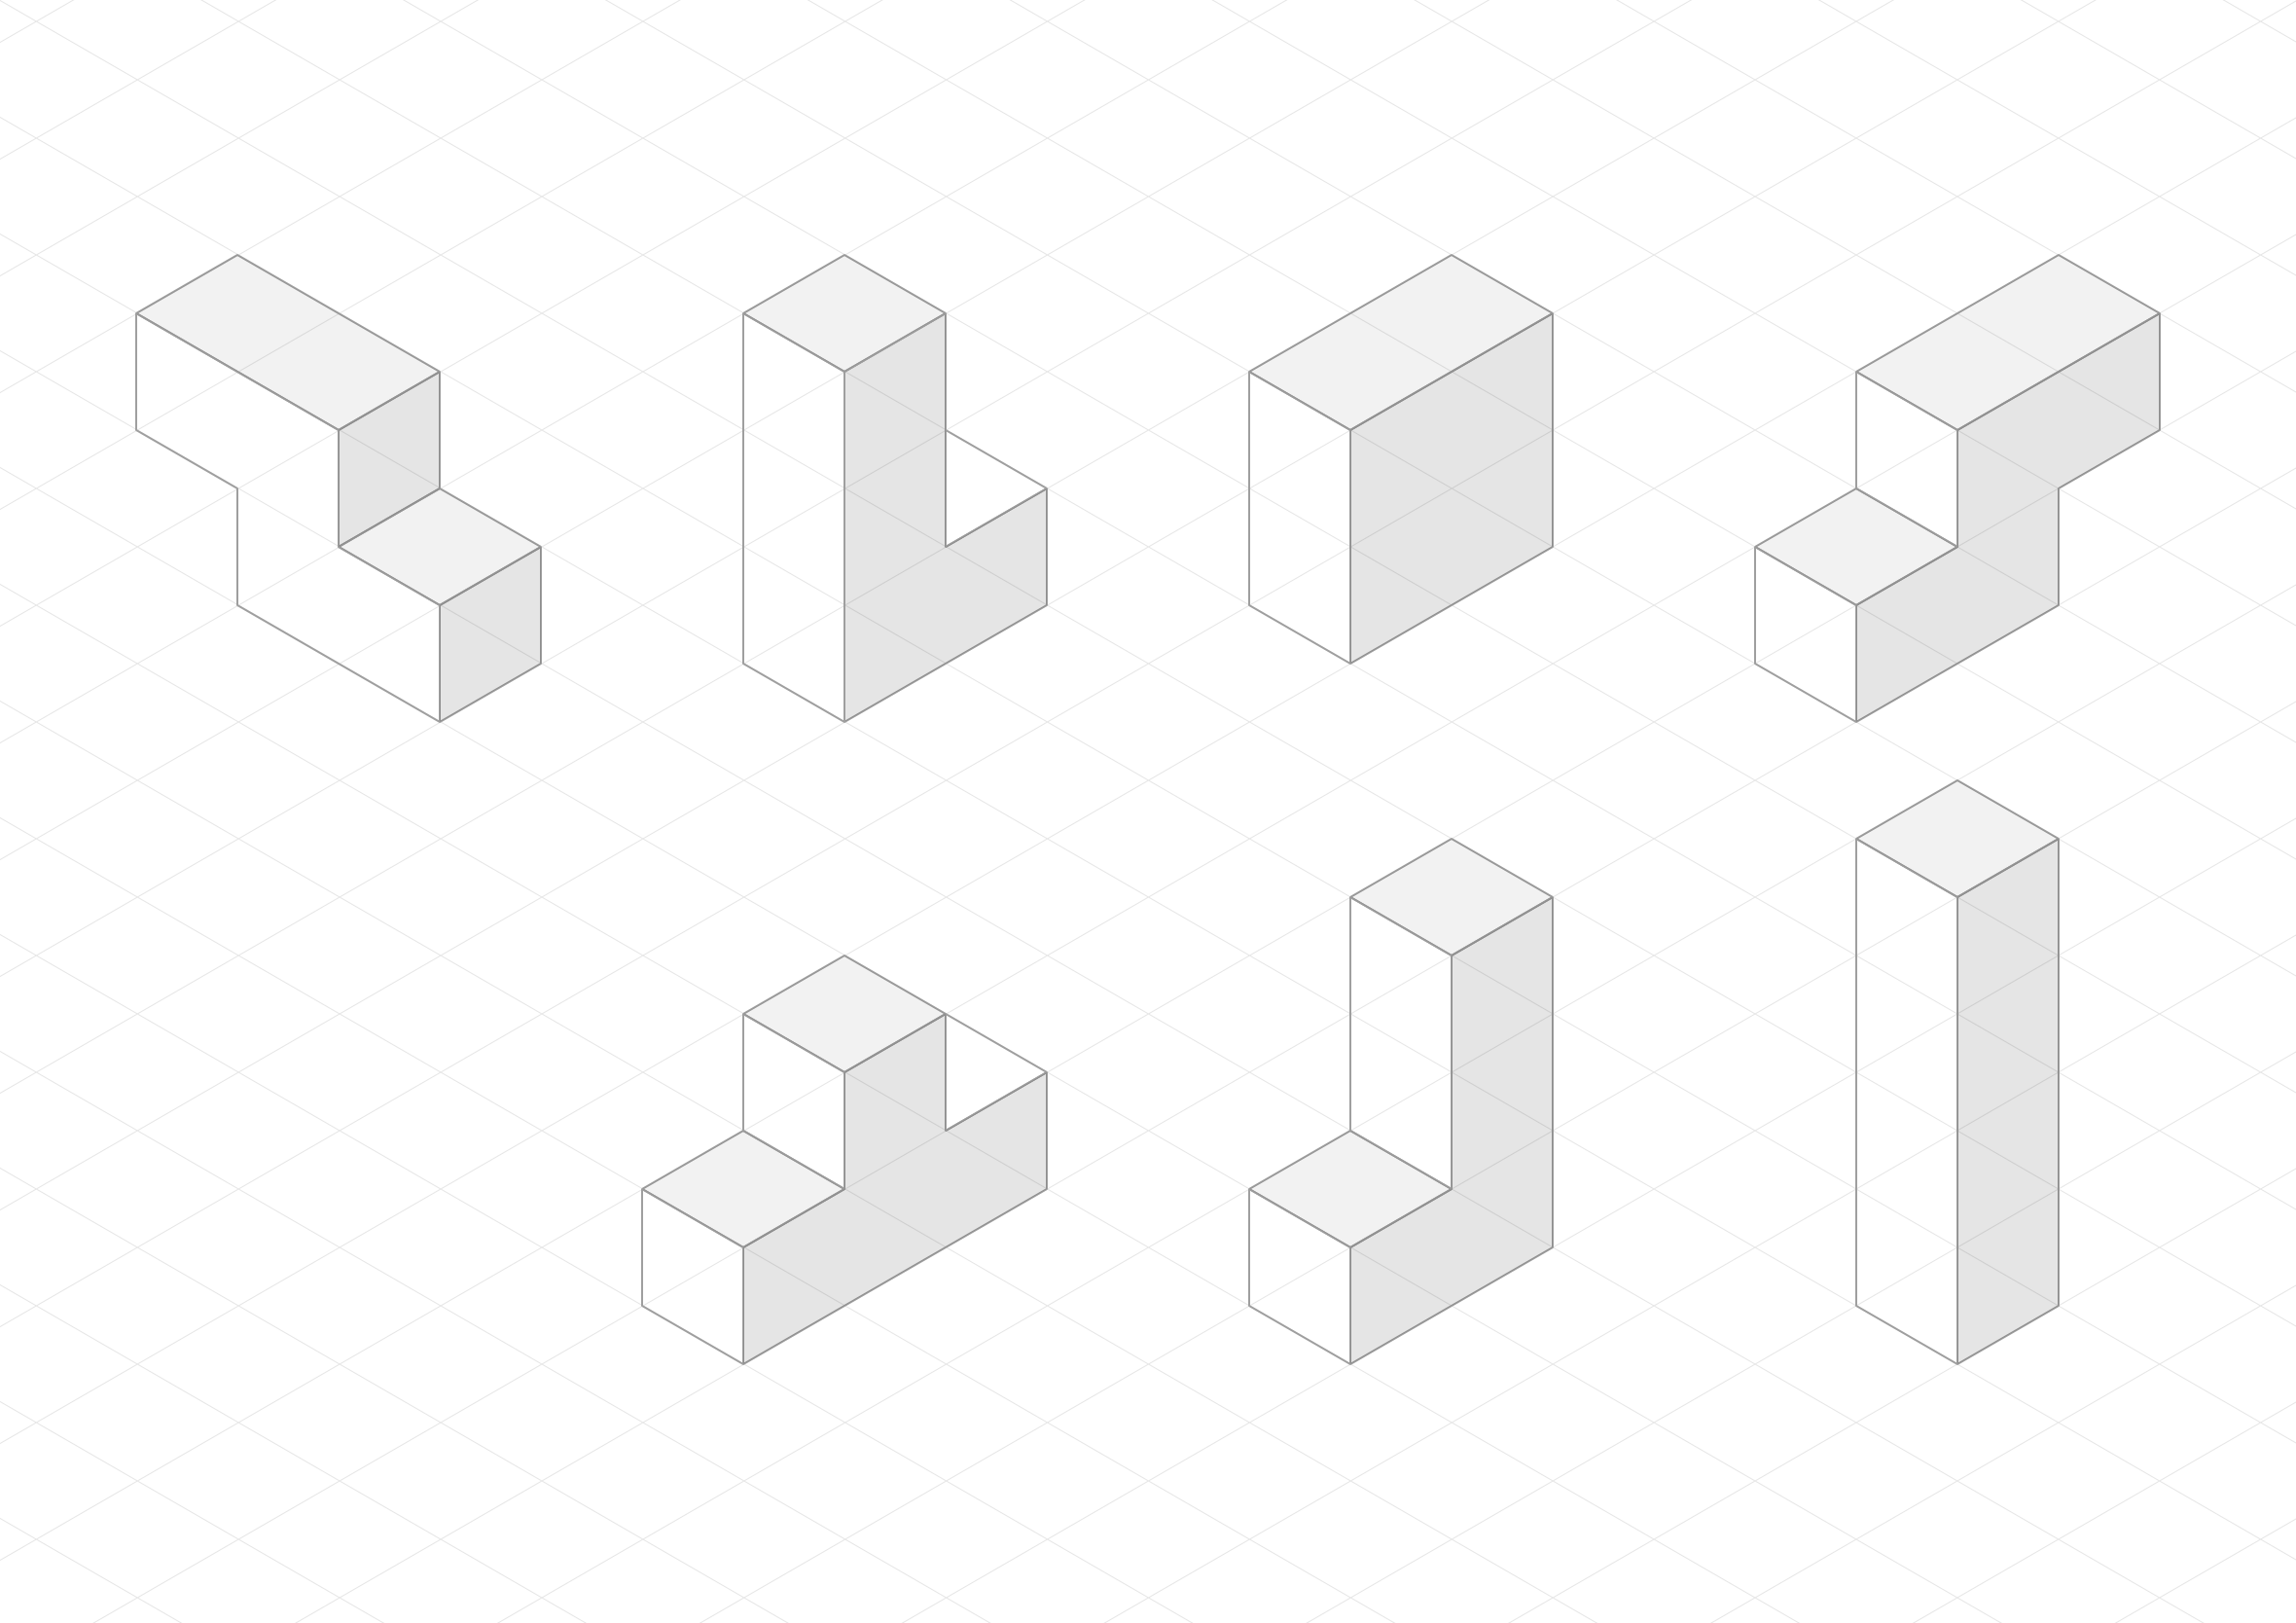 isometric cubes grid